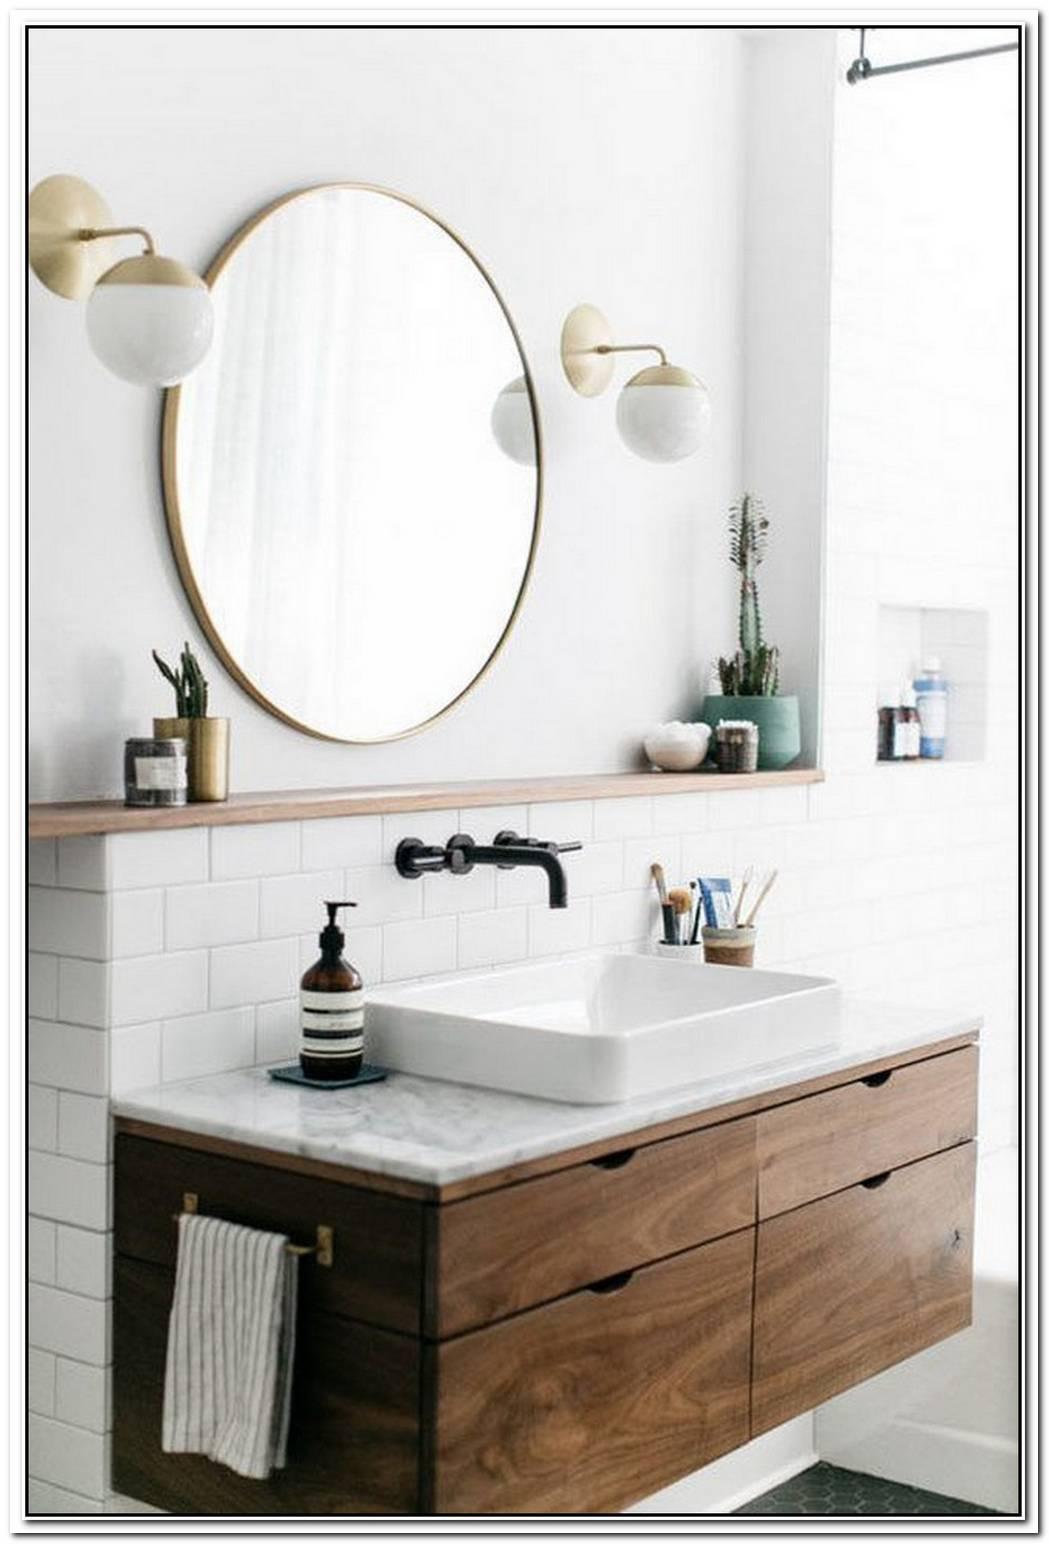 12 Classy Midcentury Modern Bathroom Ideas